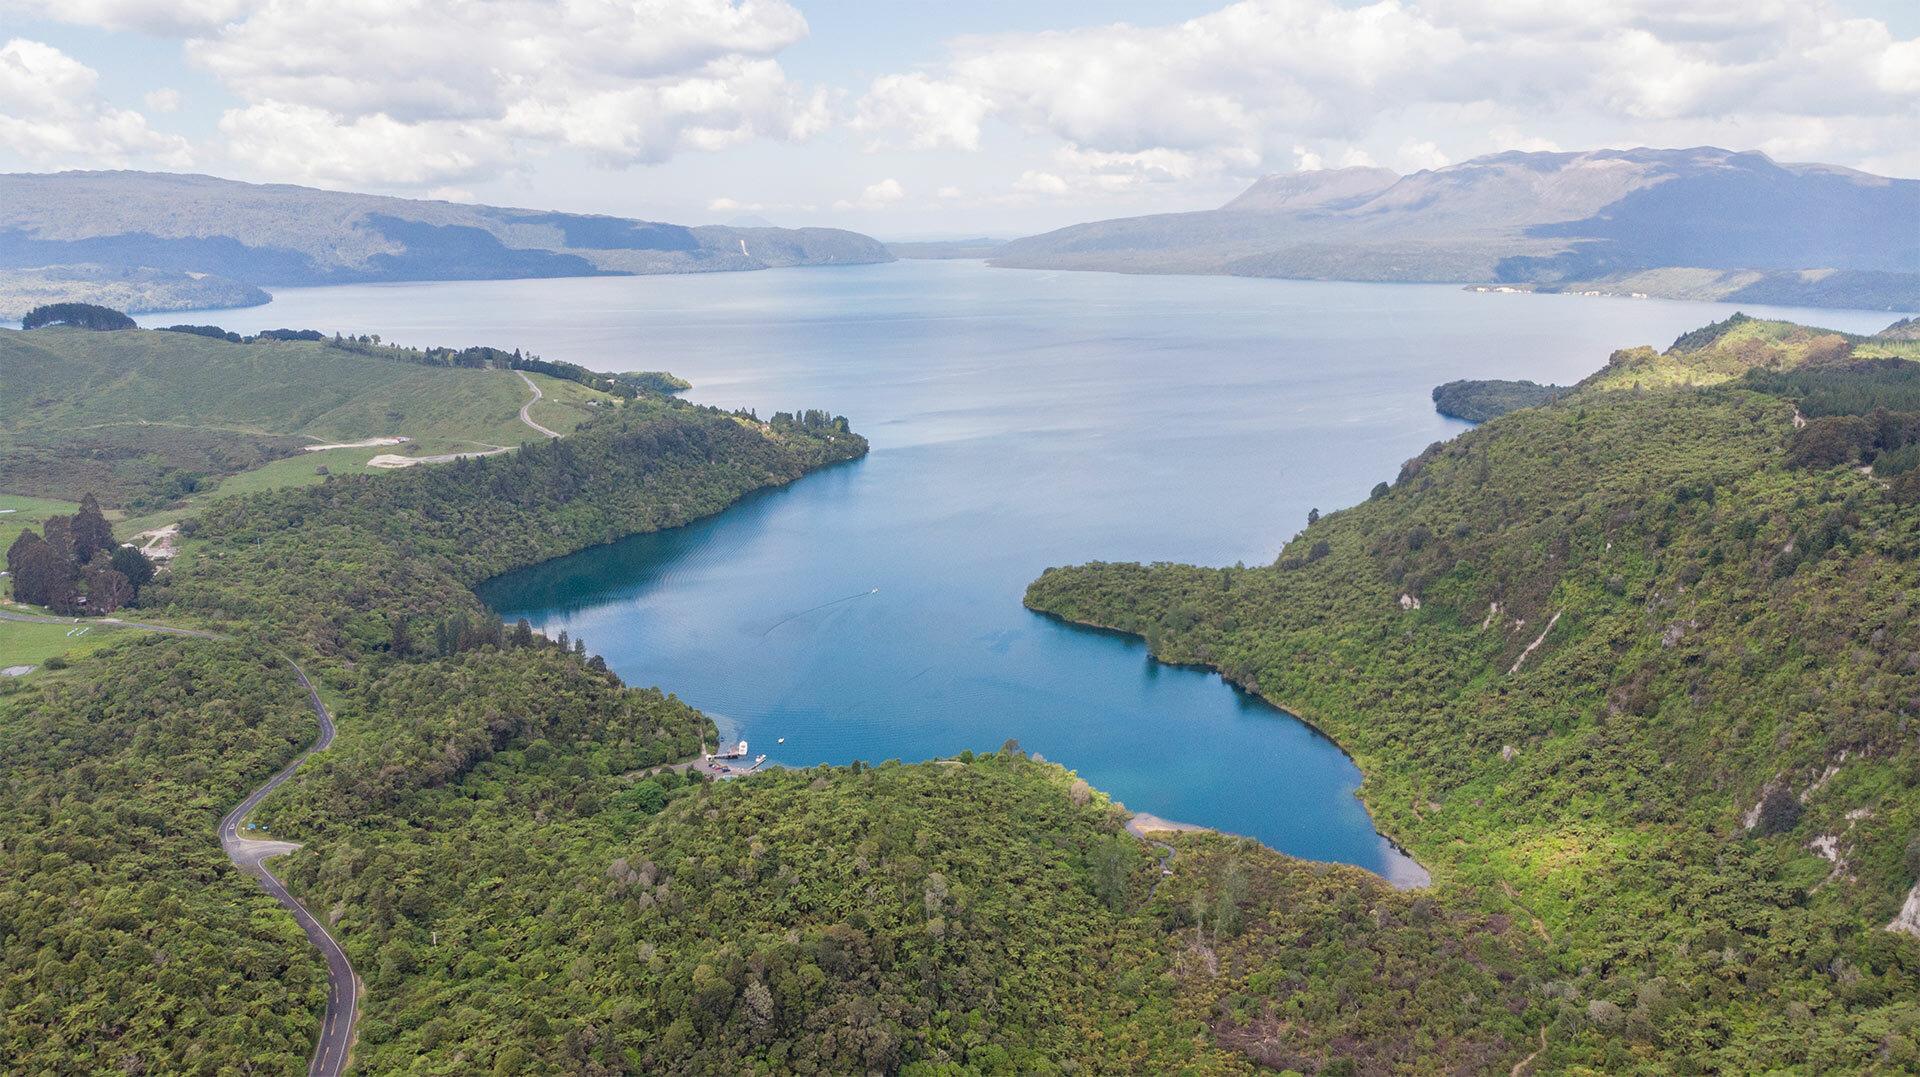 Land-use change for Lake Rotorua catchment